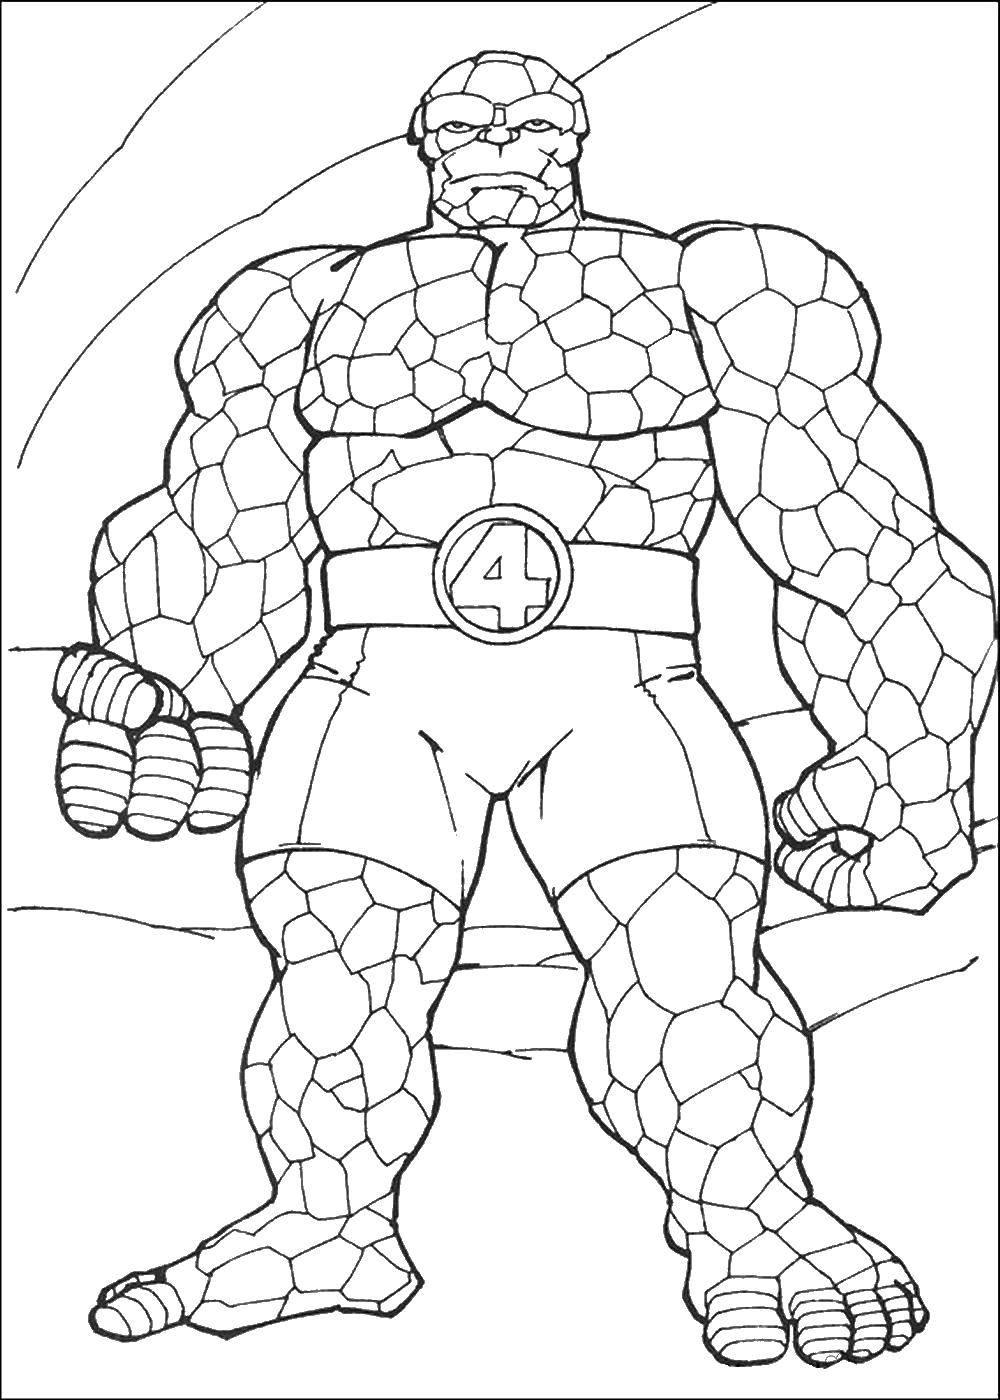 Coloring Fantastic four Download ,superheroes, cartoons, fantastic four,.  Print